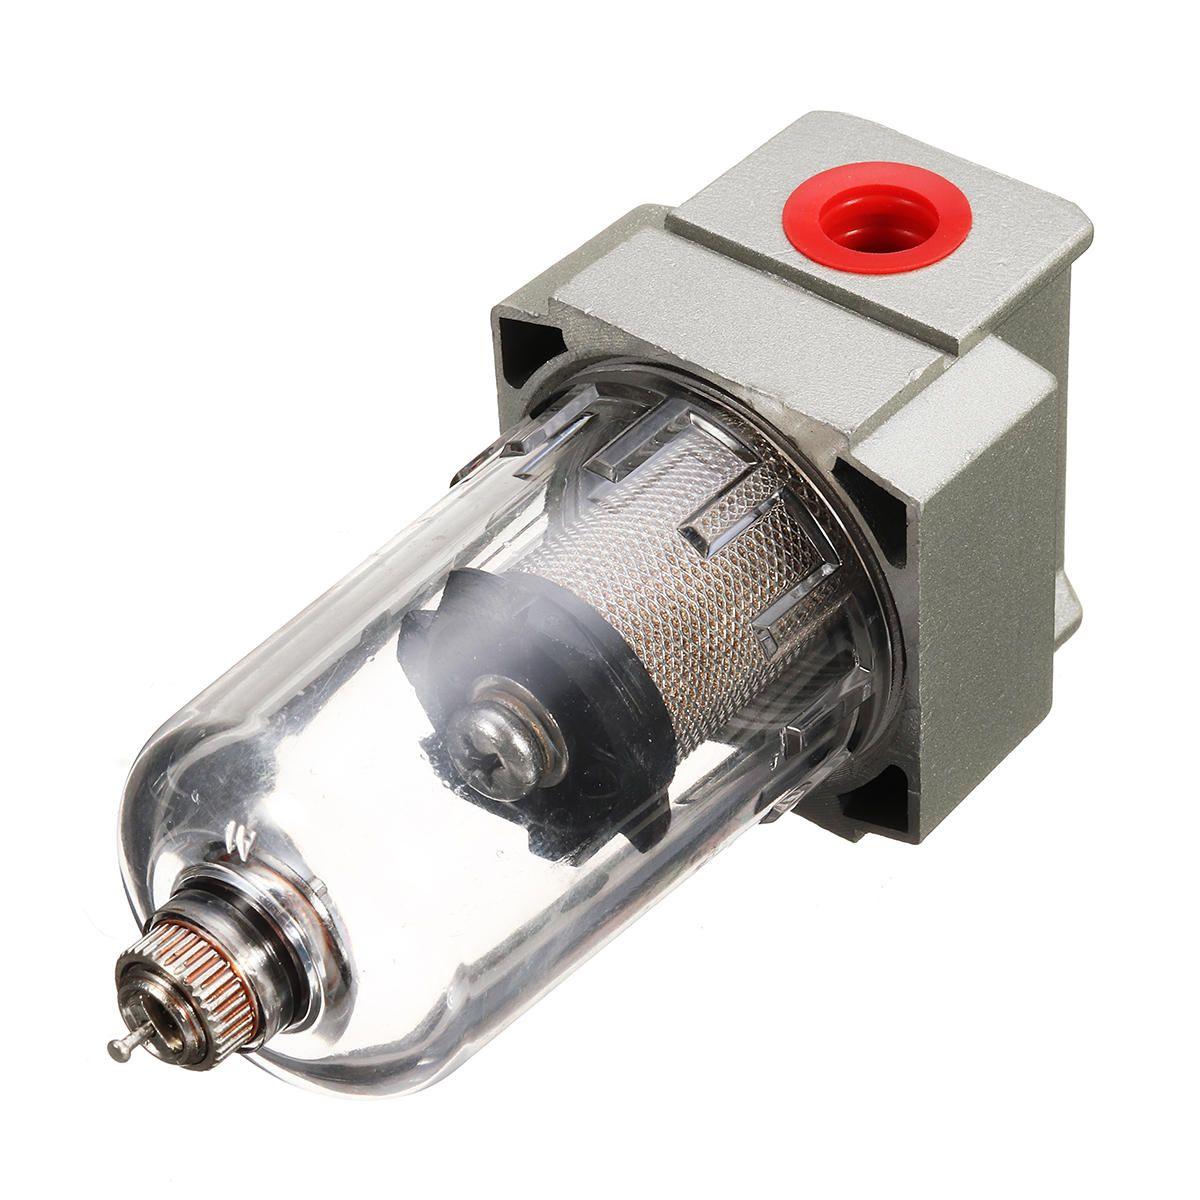 US12.92 Oil Water Air Separator Compressor Filter Trap